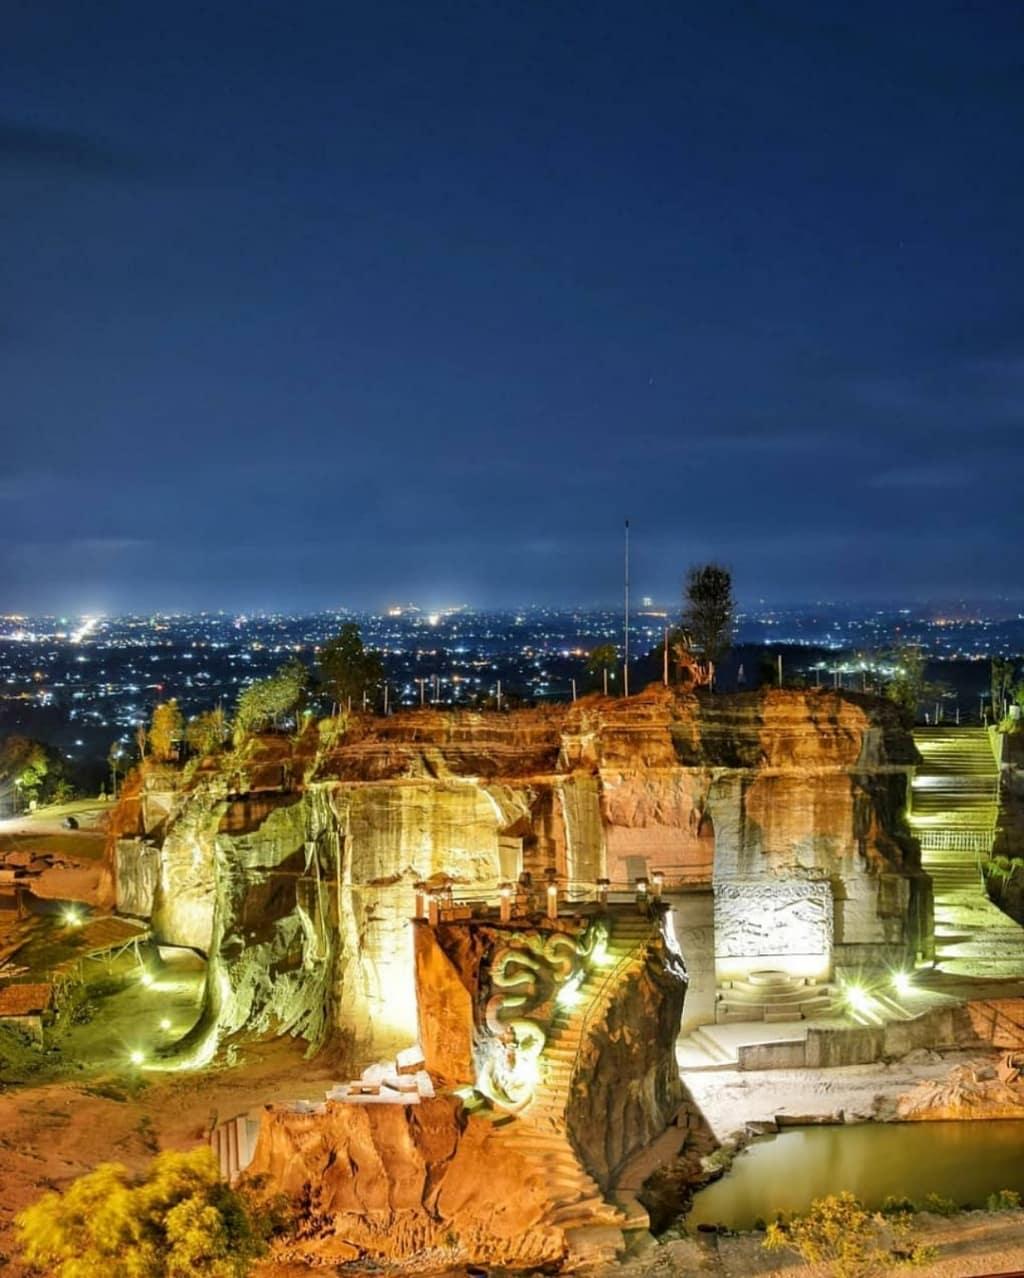 7 Tempat Wisata Malam Jogja Terbaru Yang Wajib Dikunjungi